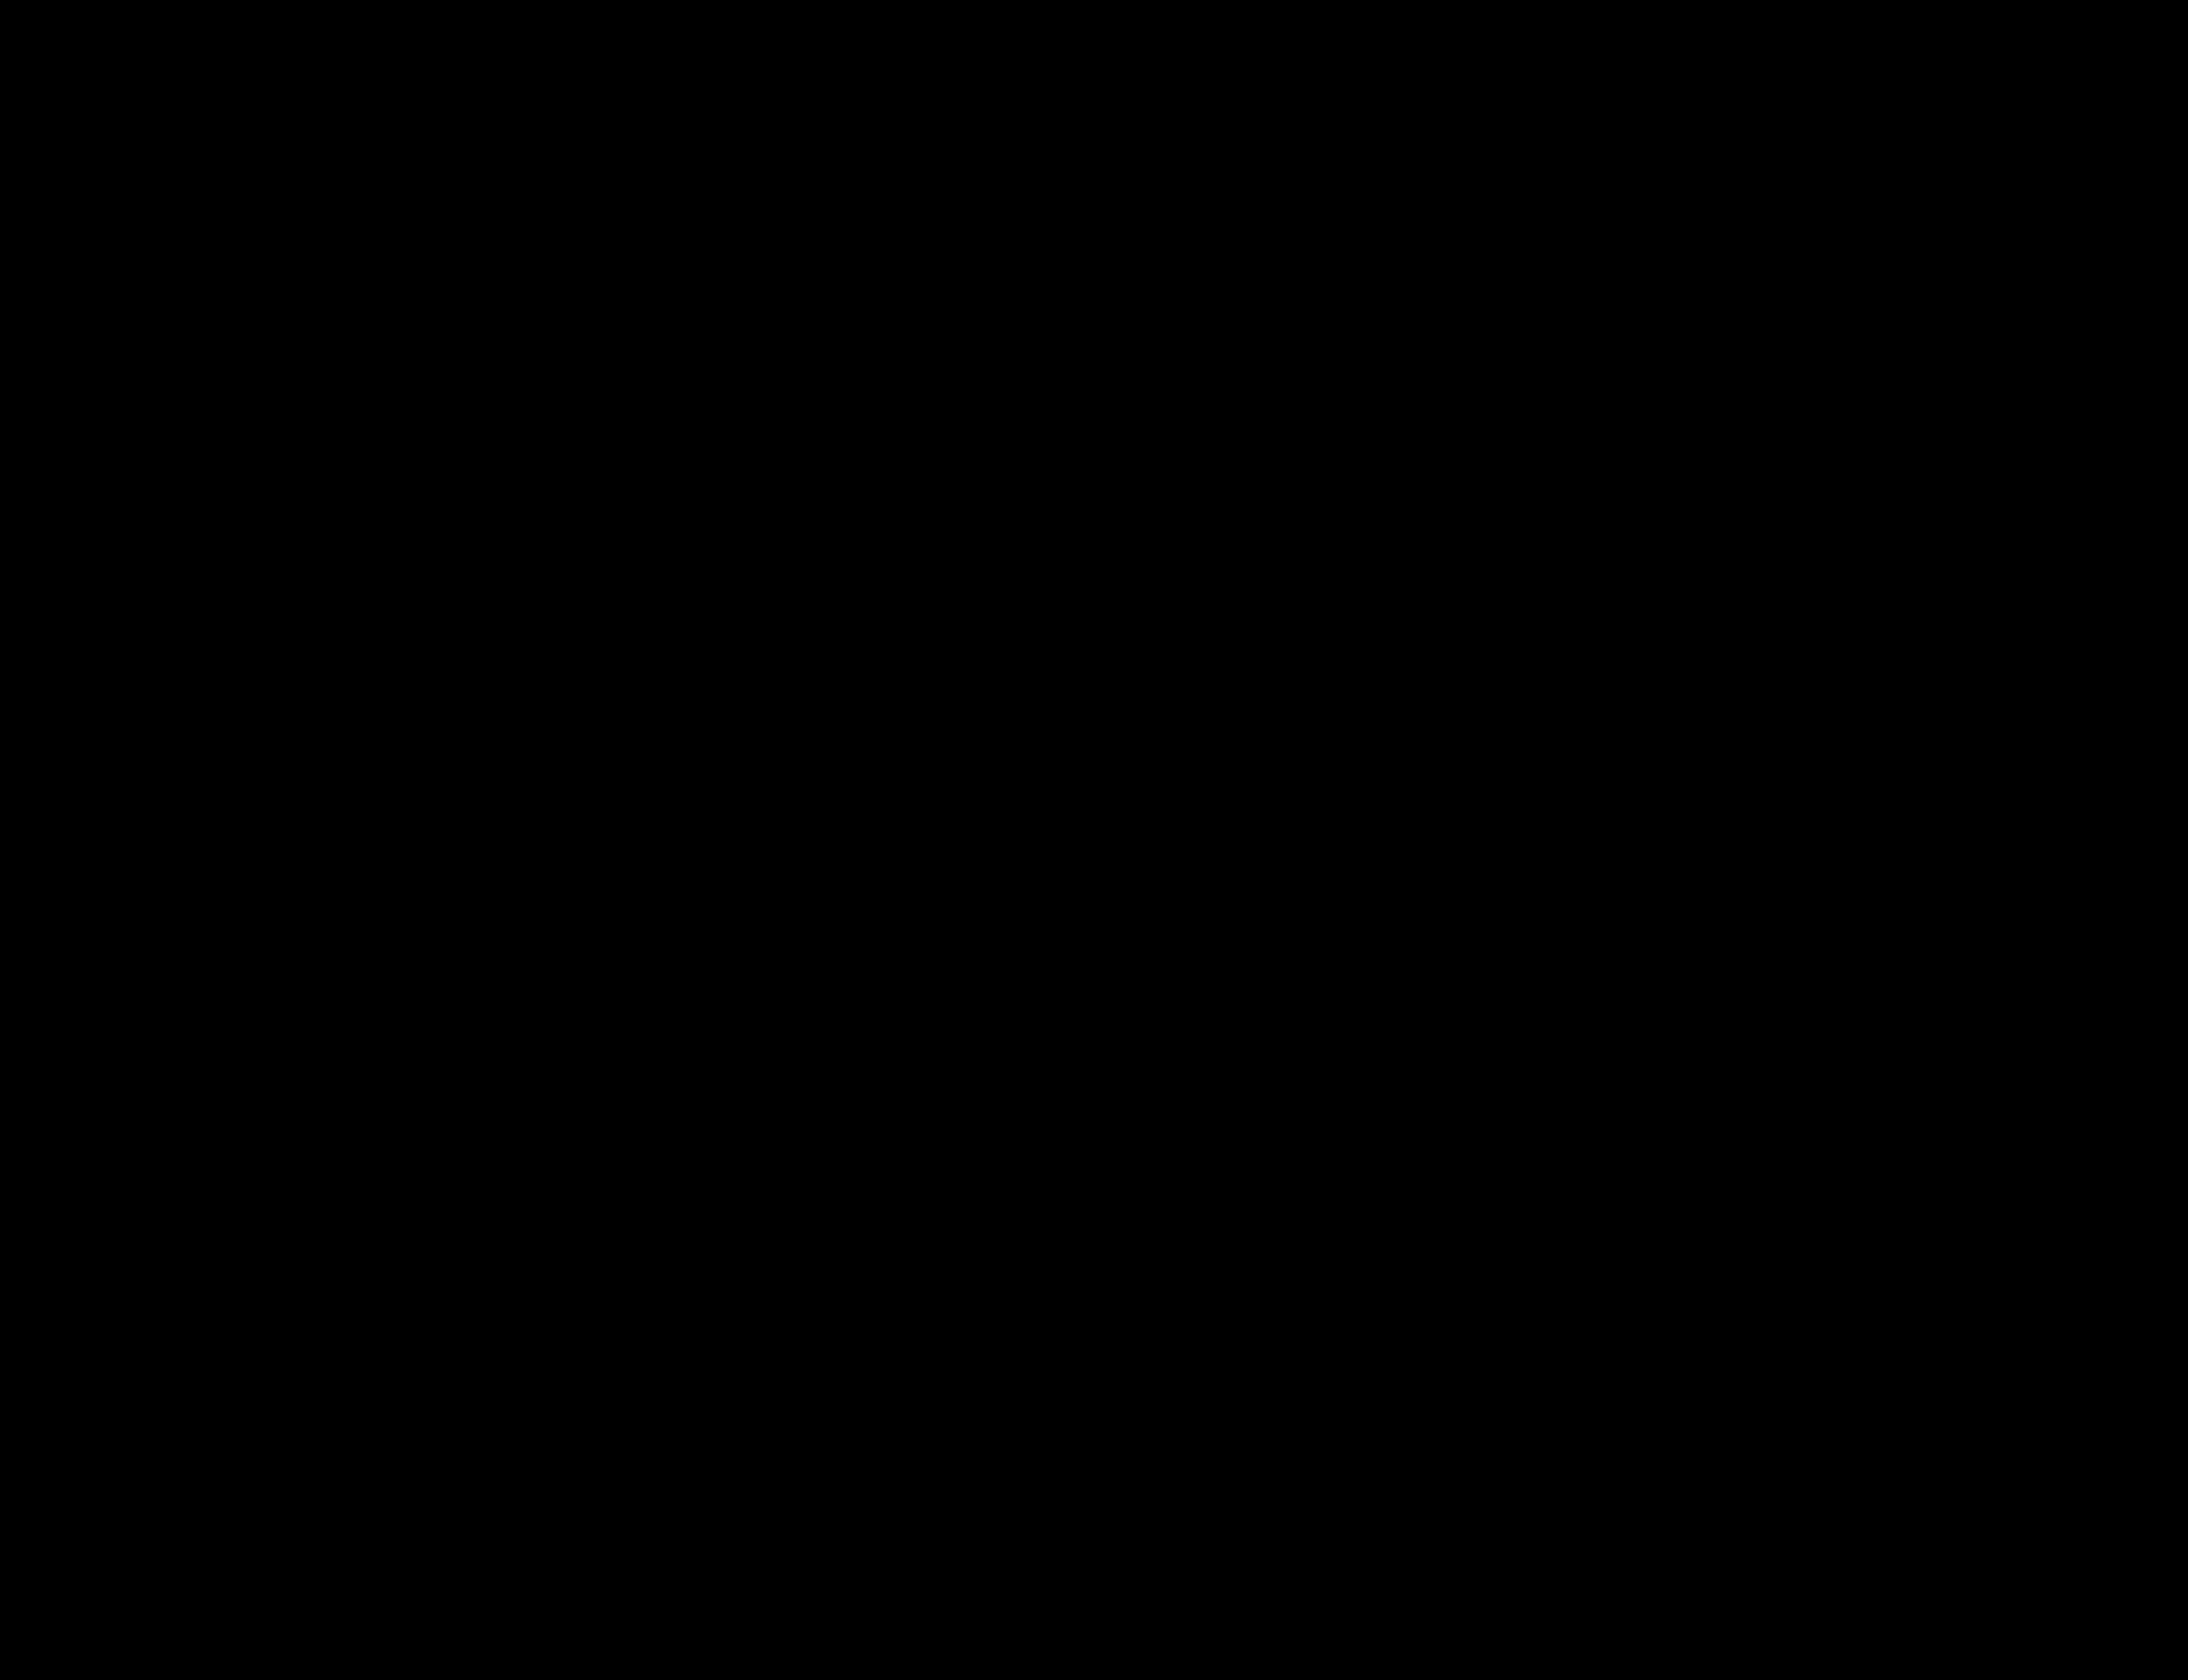 Cross Logo Black